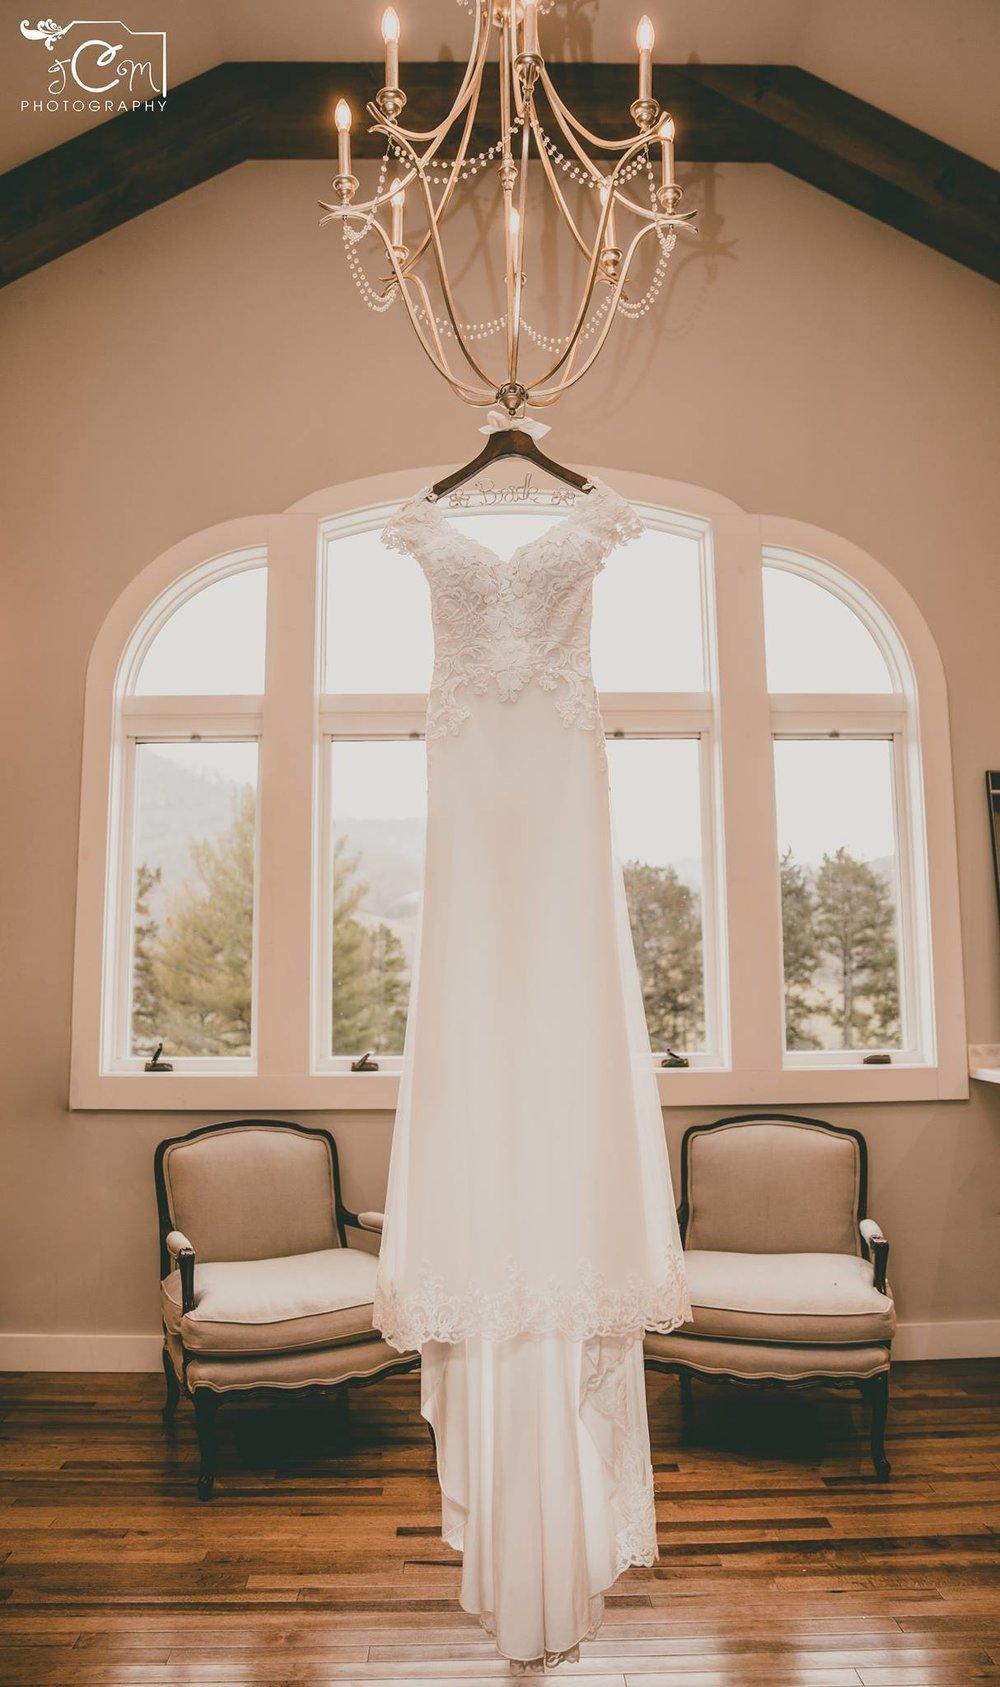 dress in bridal suite jcm photo.jpg